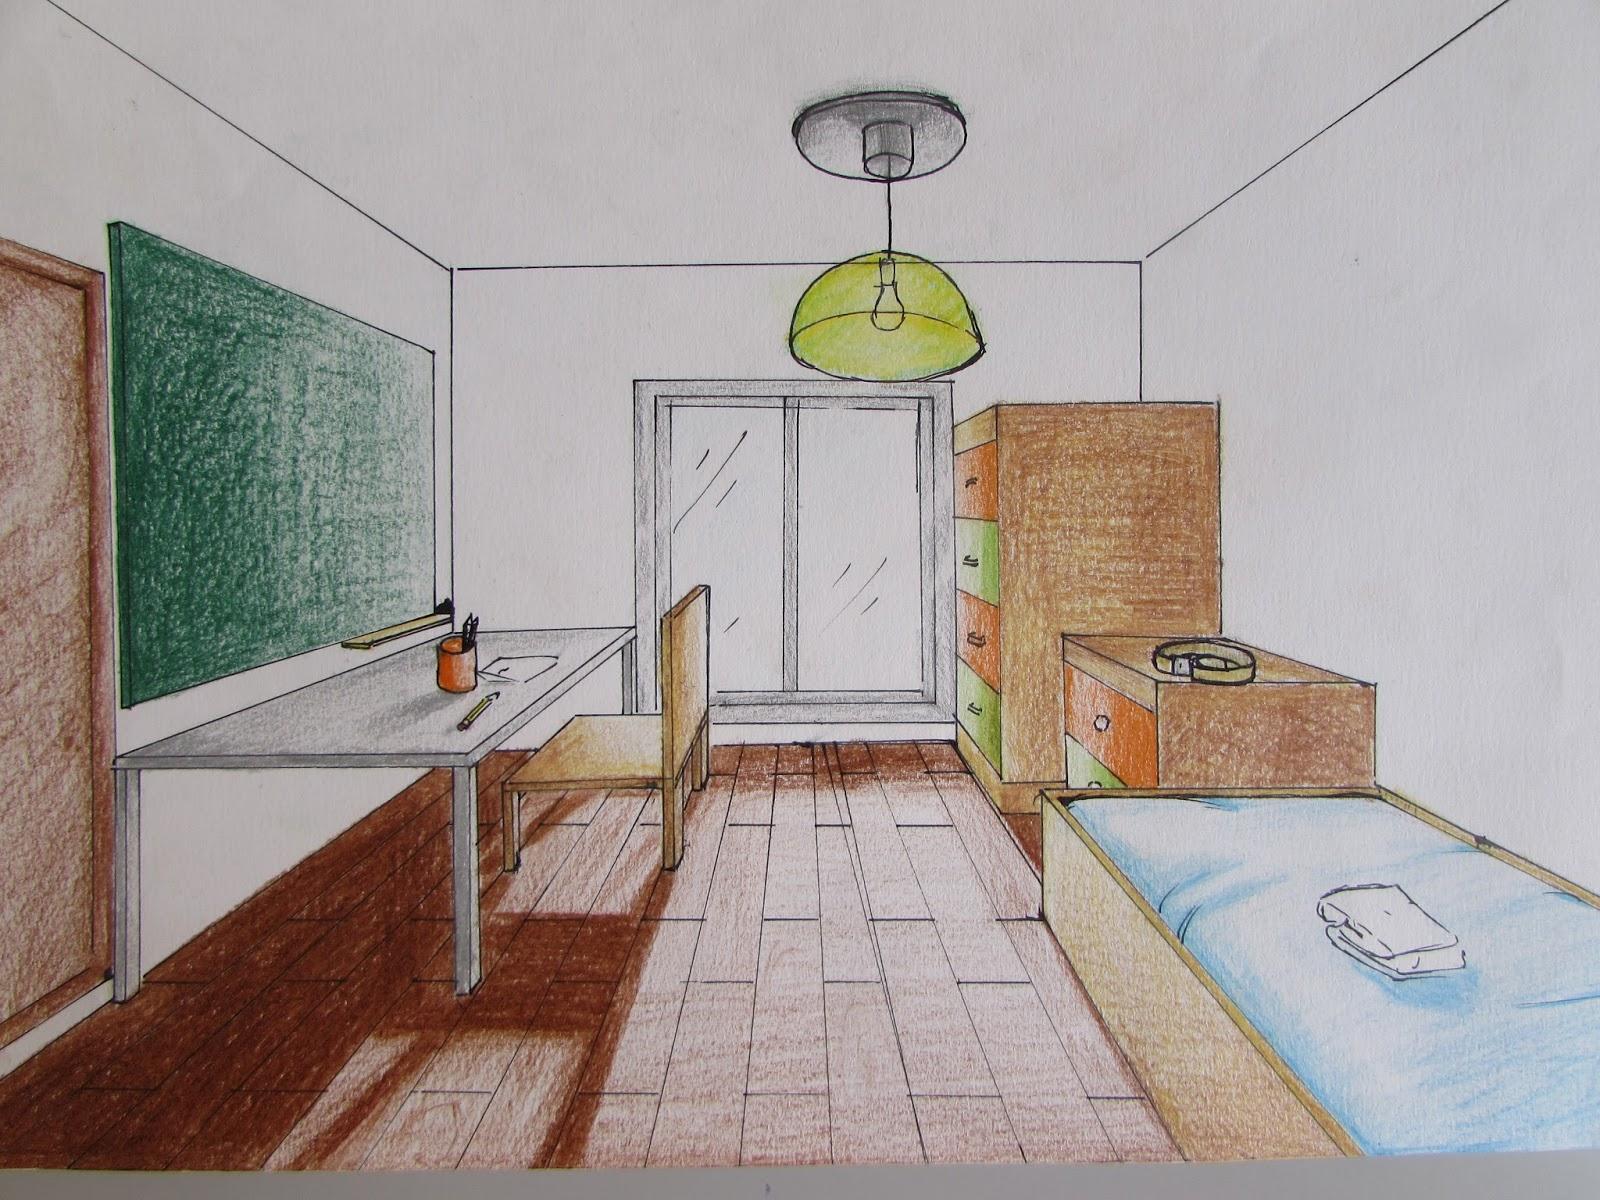 Pl stica escola p a castell n tu habitaci n en perspectiva for Dormitorio para dibujar facil